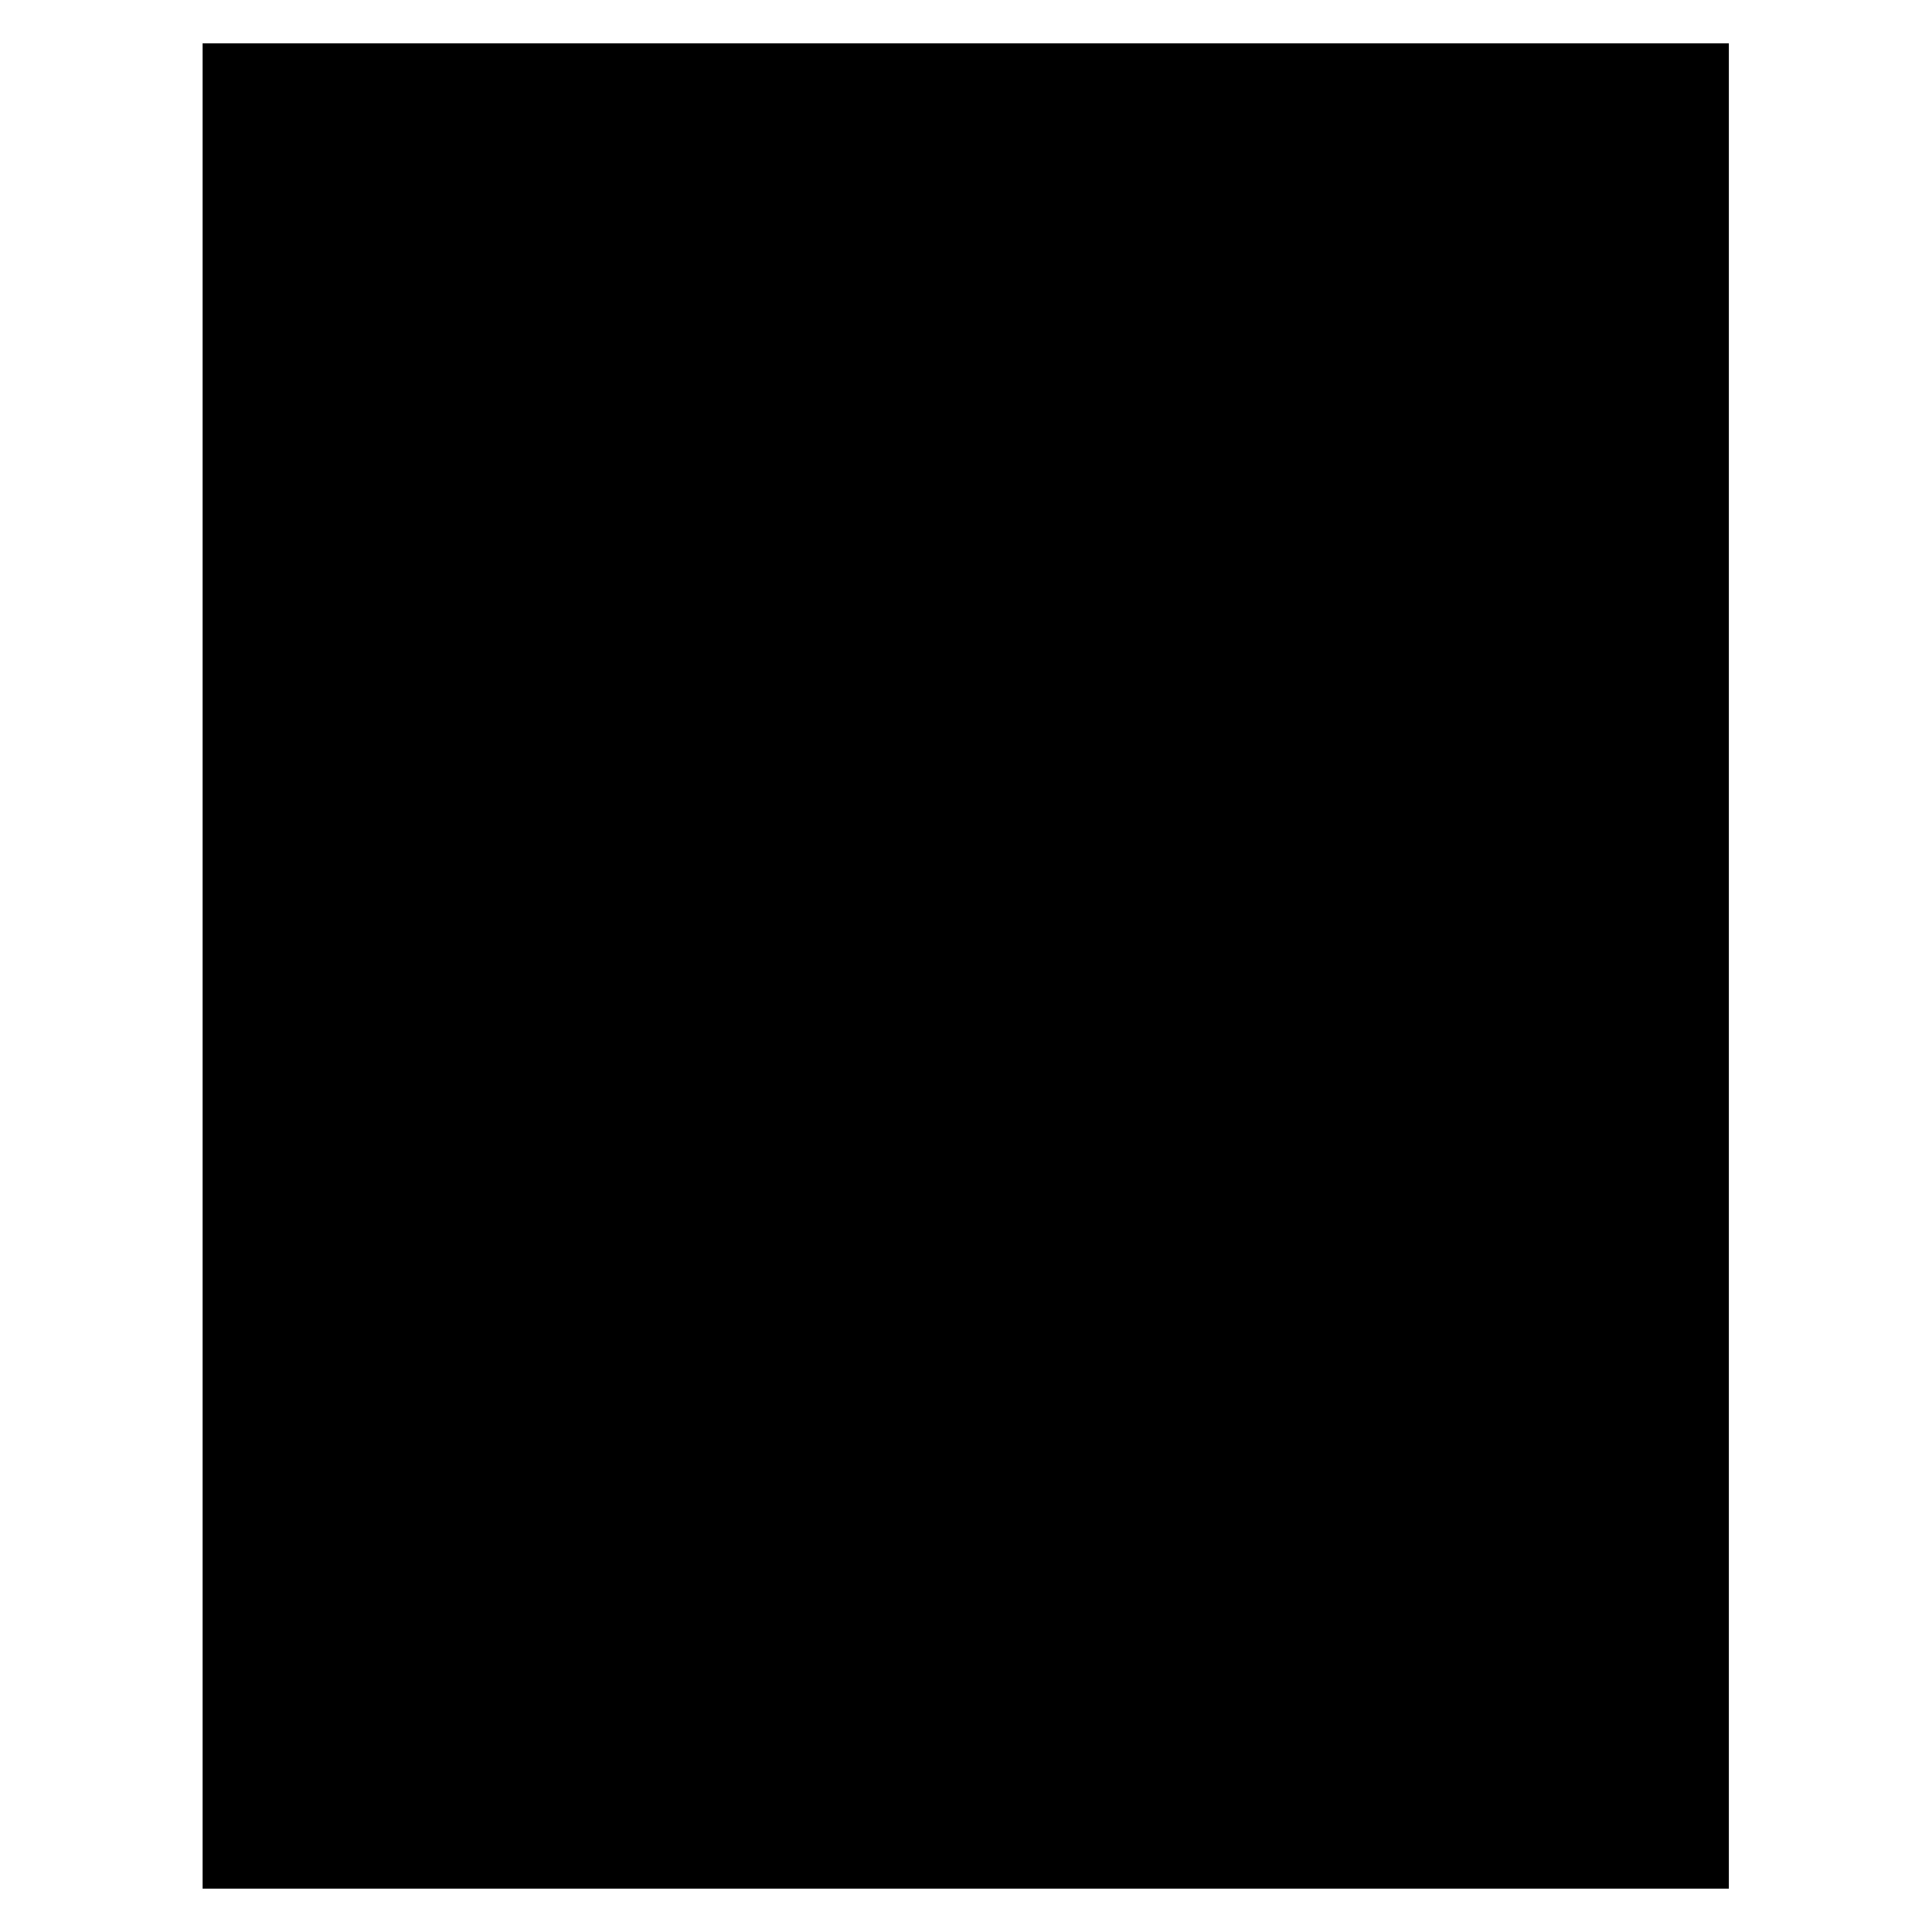 Fortnite Floss Png